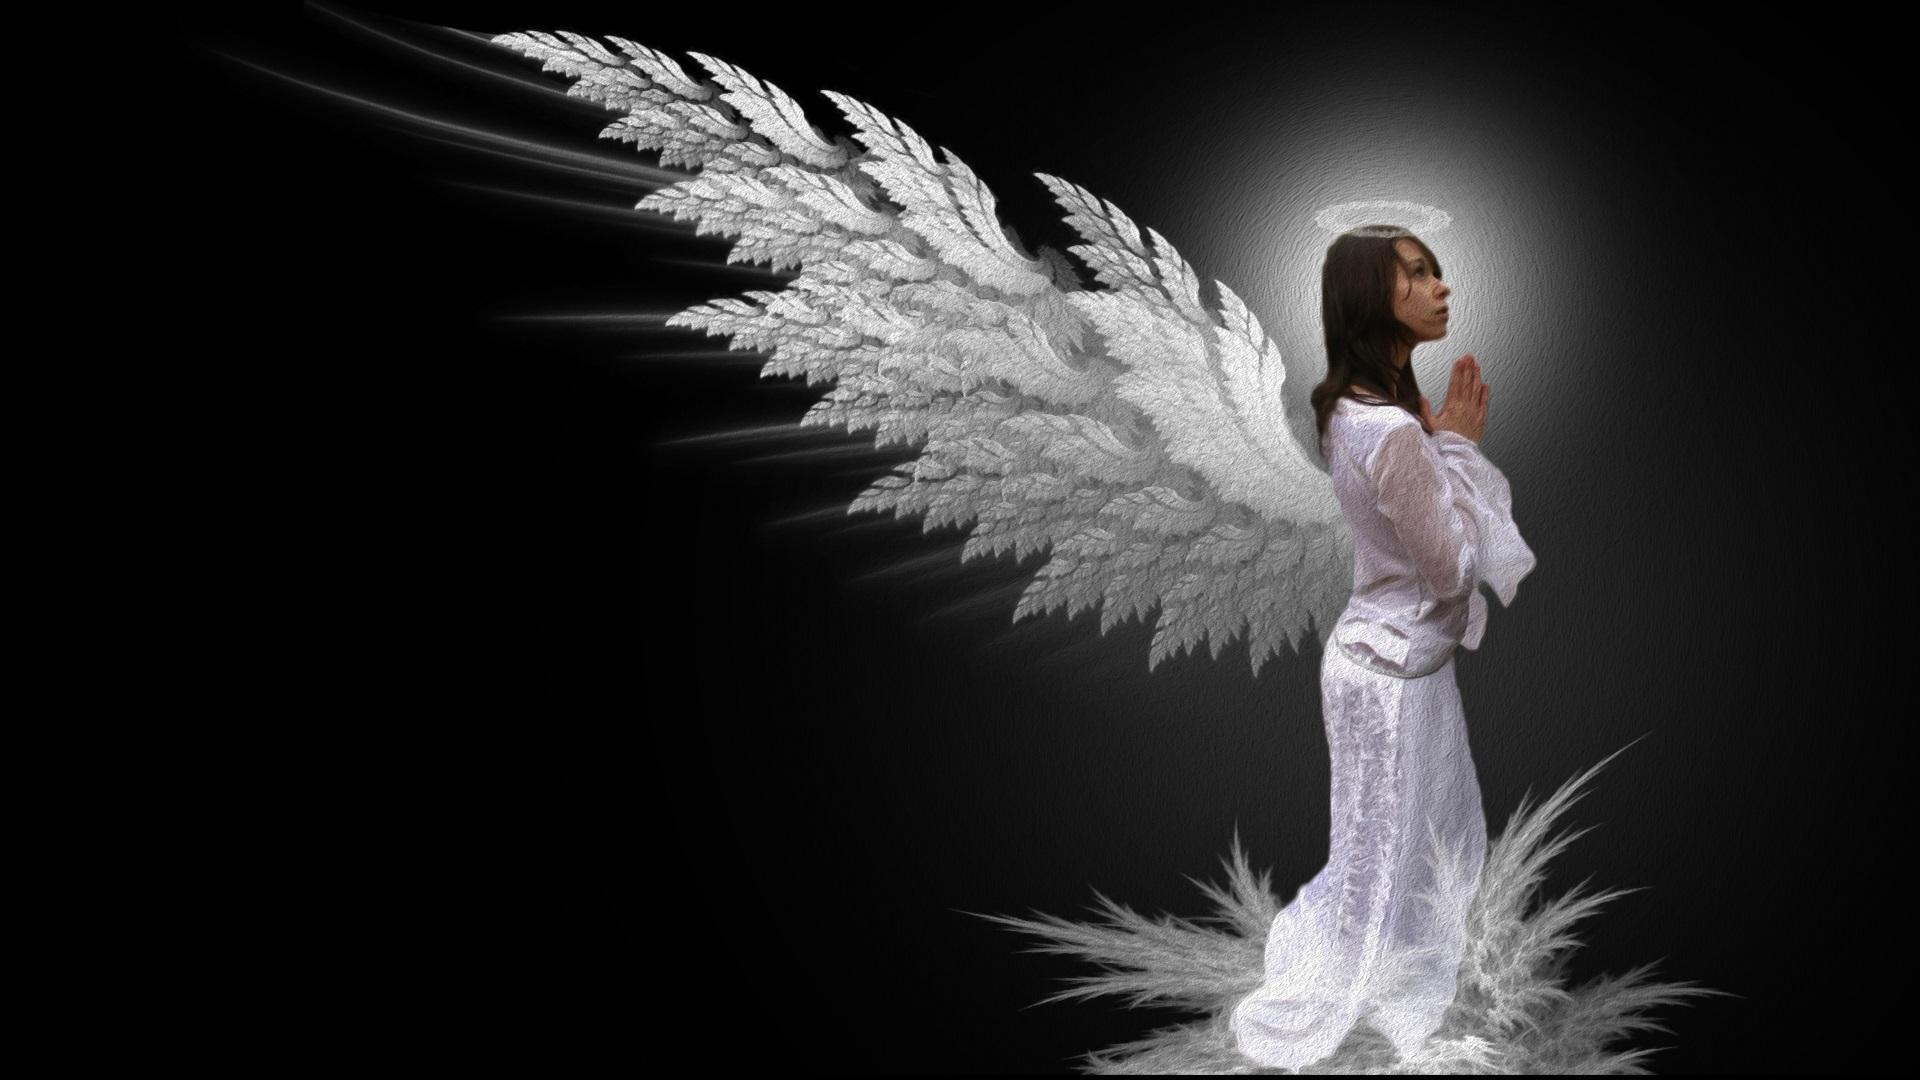 Archangel ariel brings us courage inner force grace archangel ariel angelinspirro